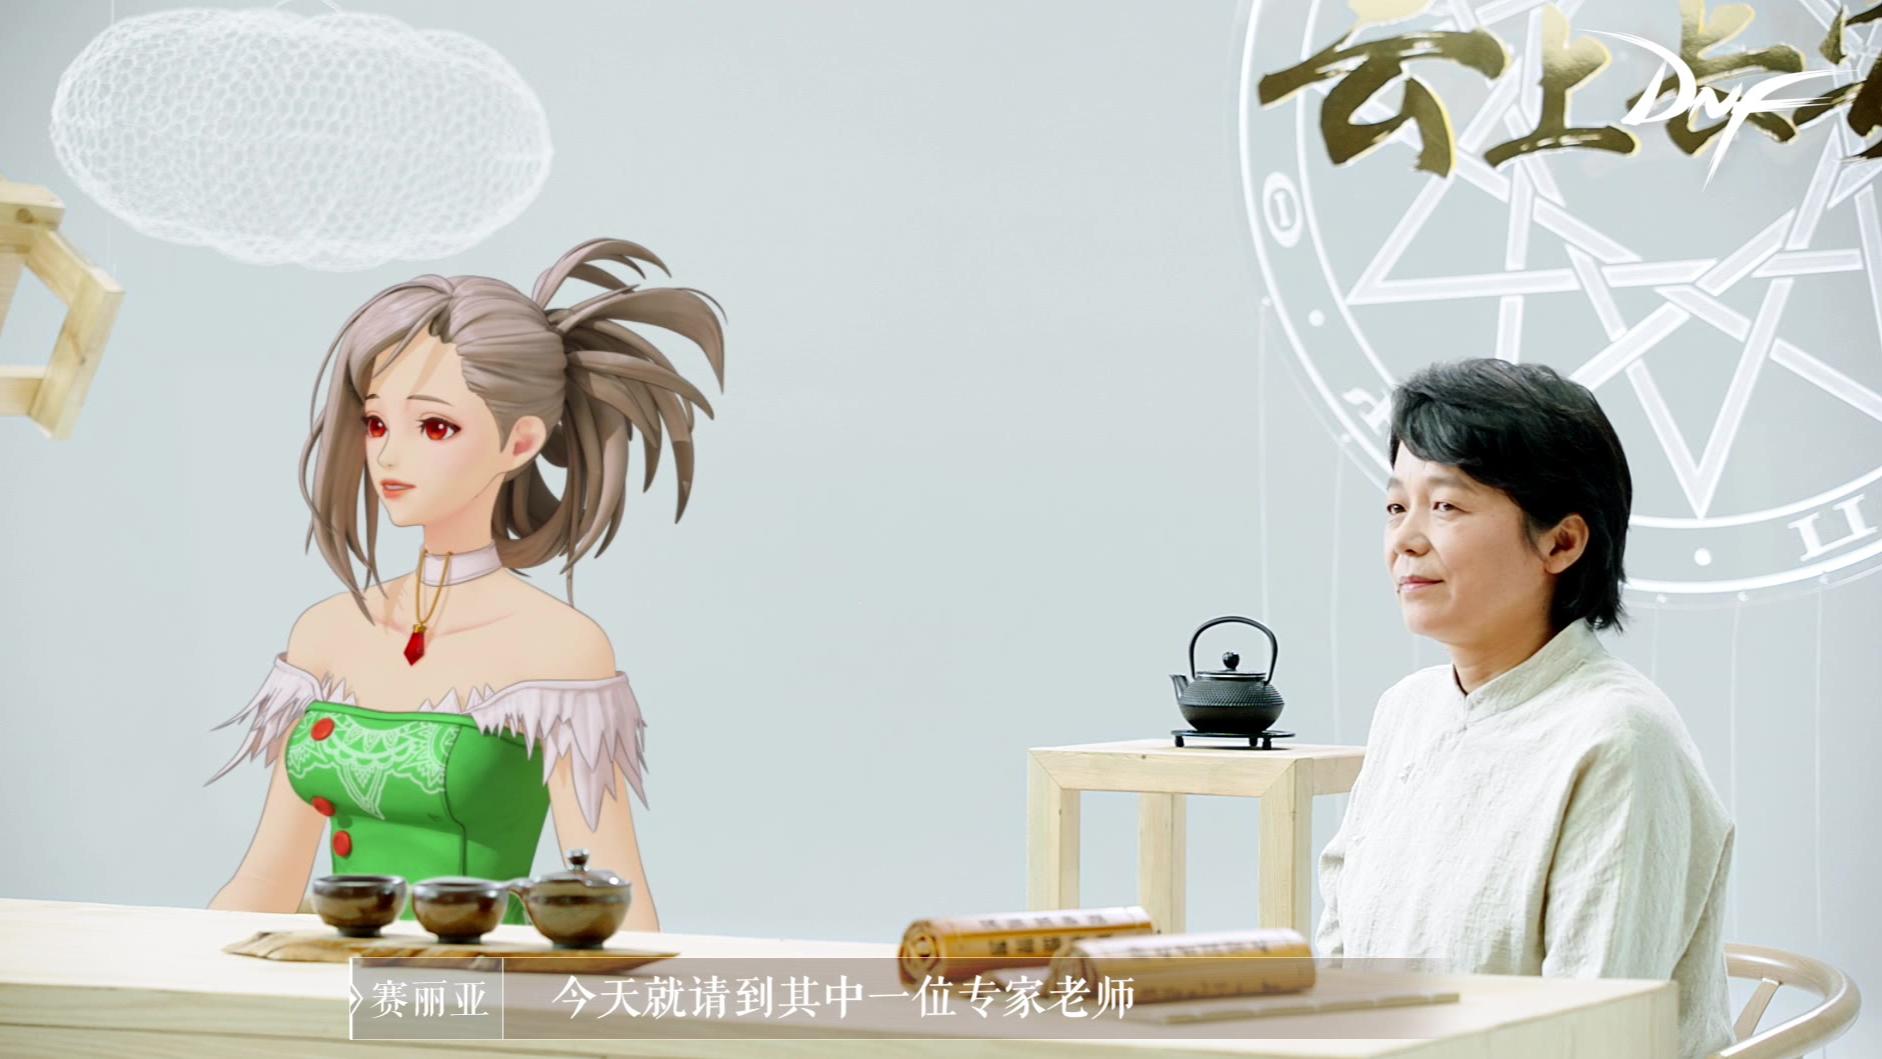 【DNF】赛丽亚历史小课堂-遗址保护篇